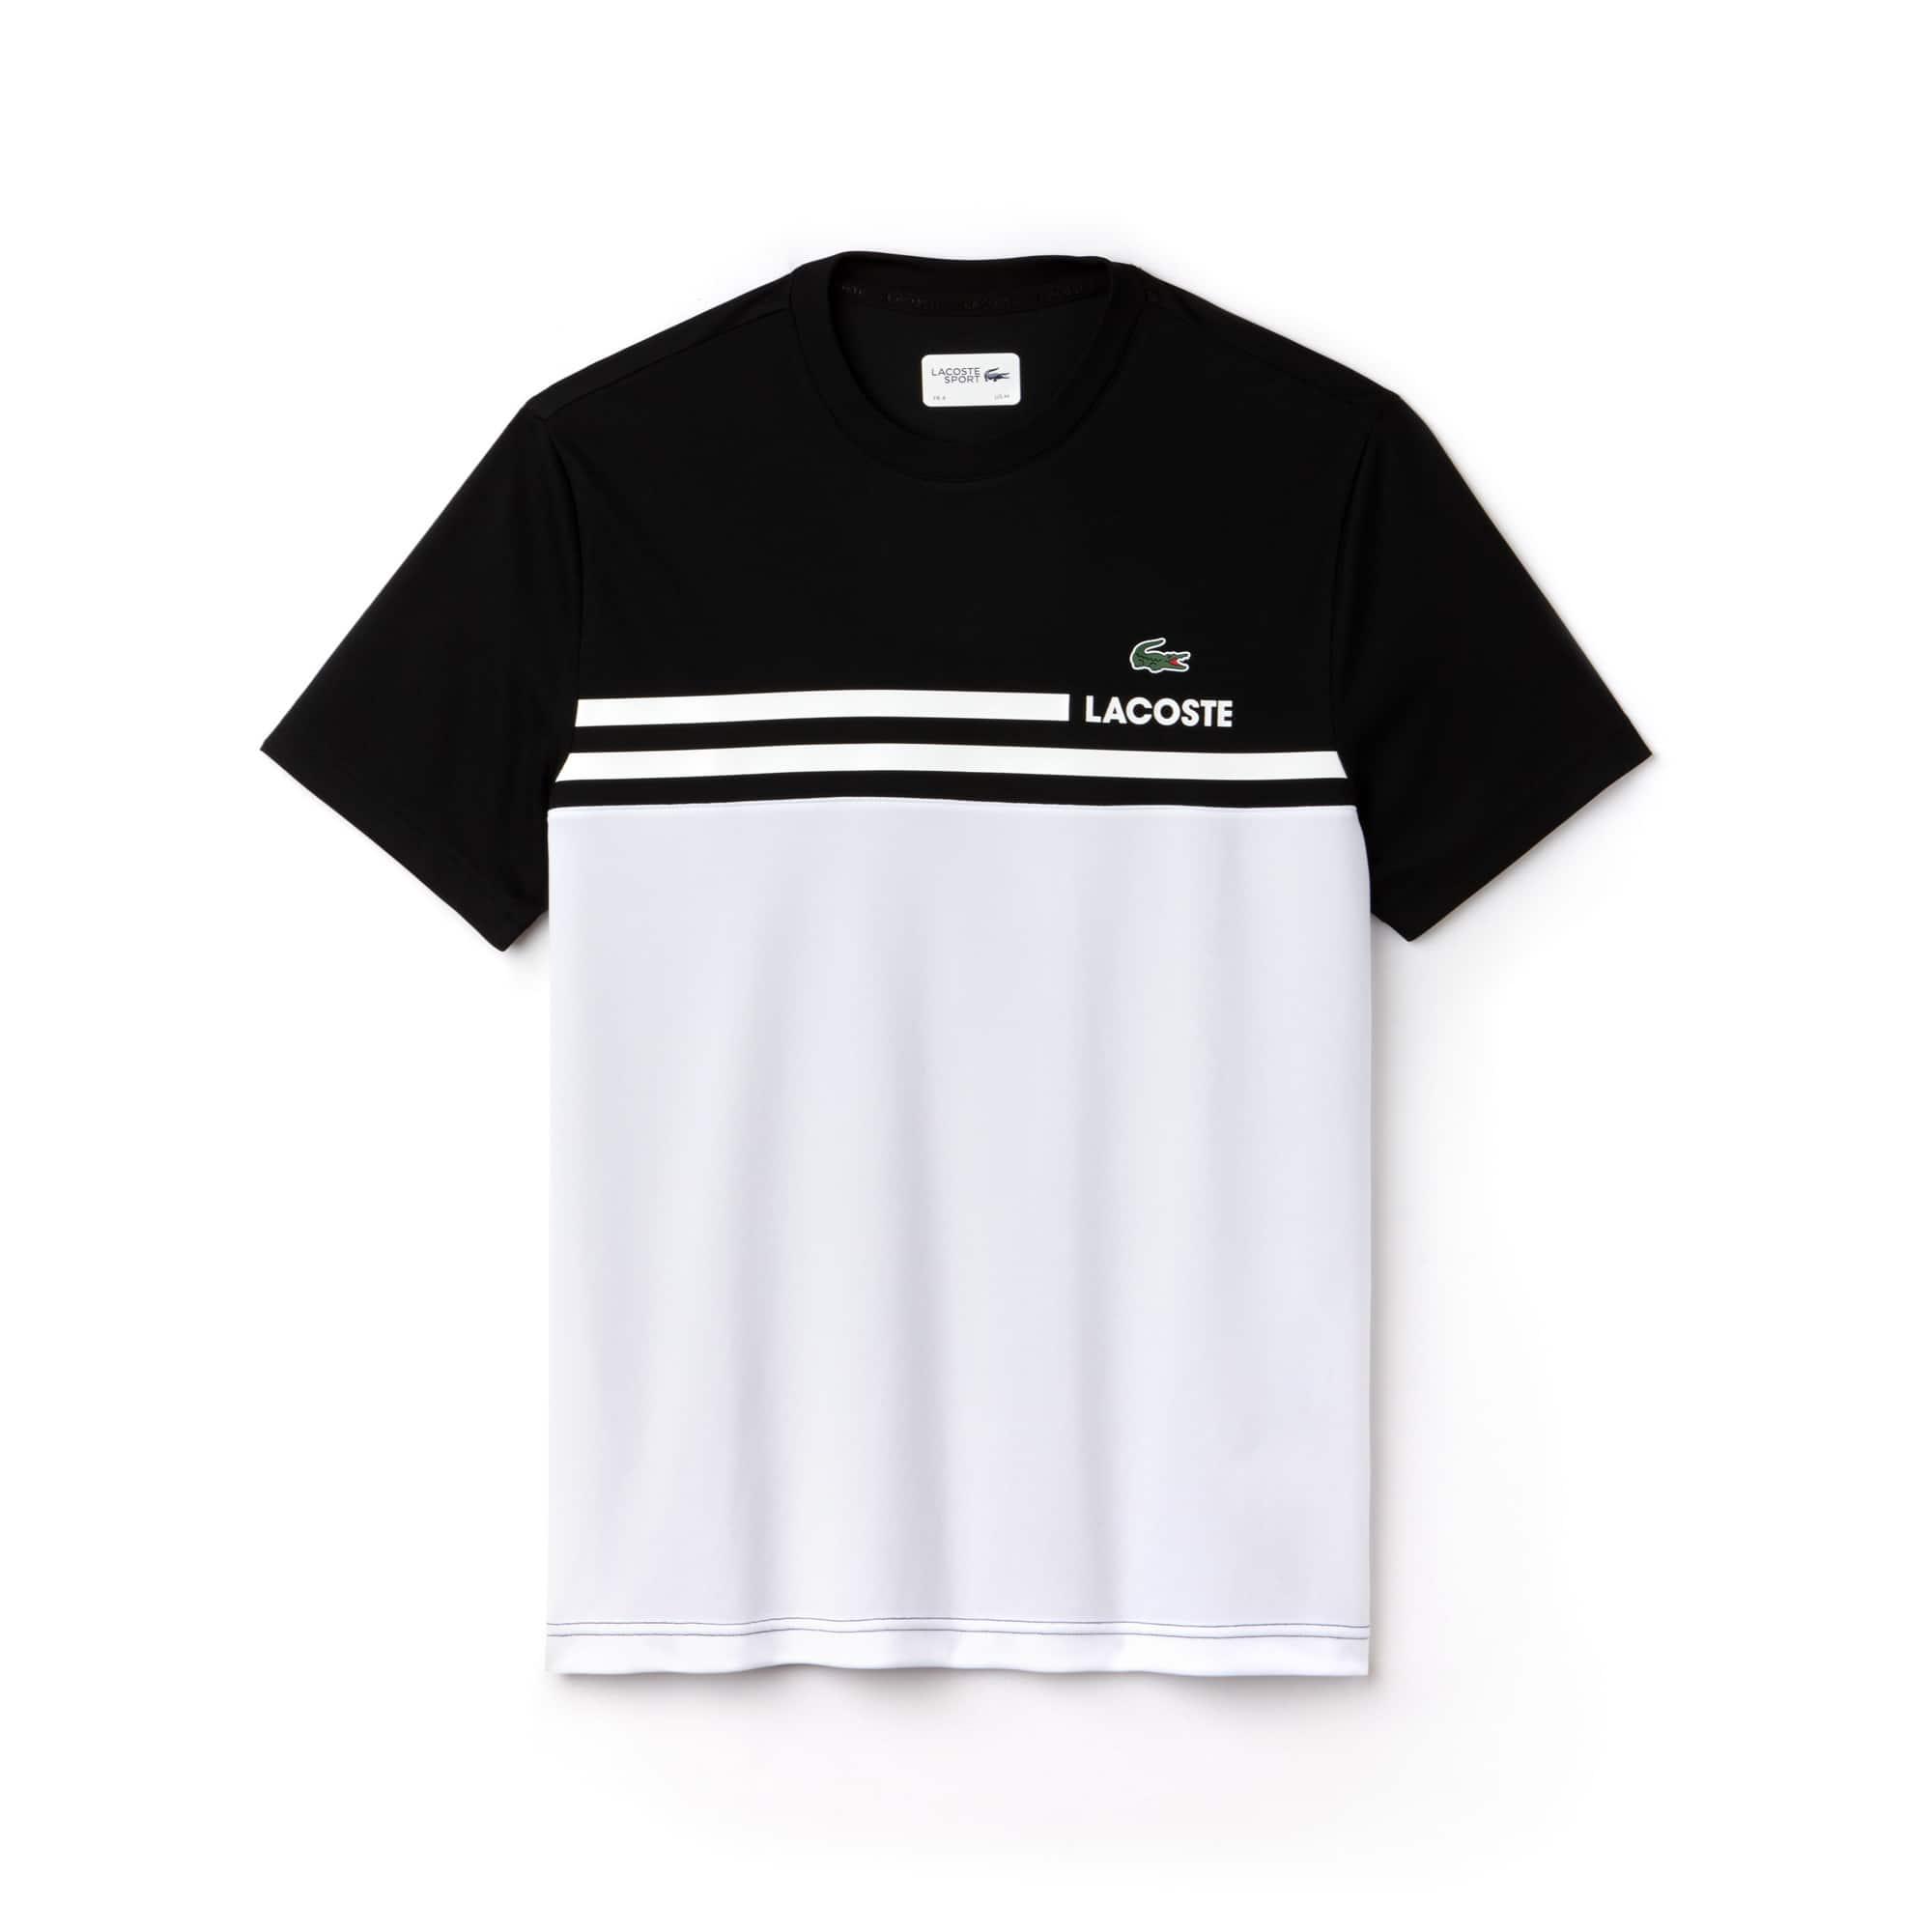 cheap lacoste shirt